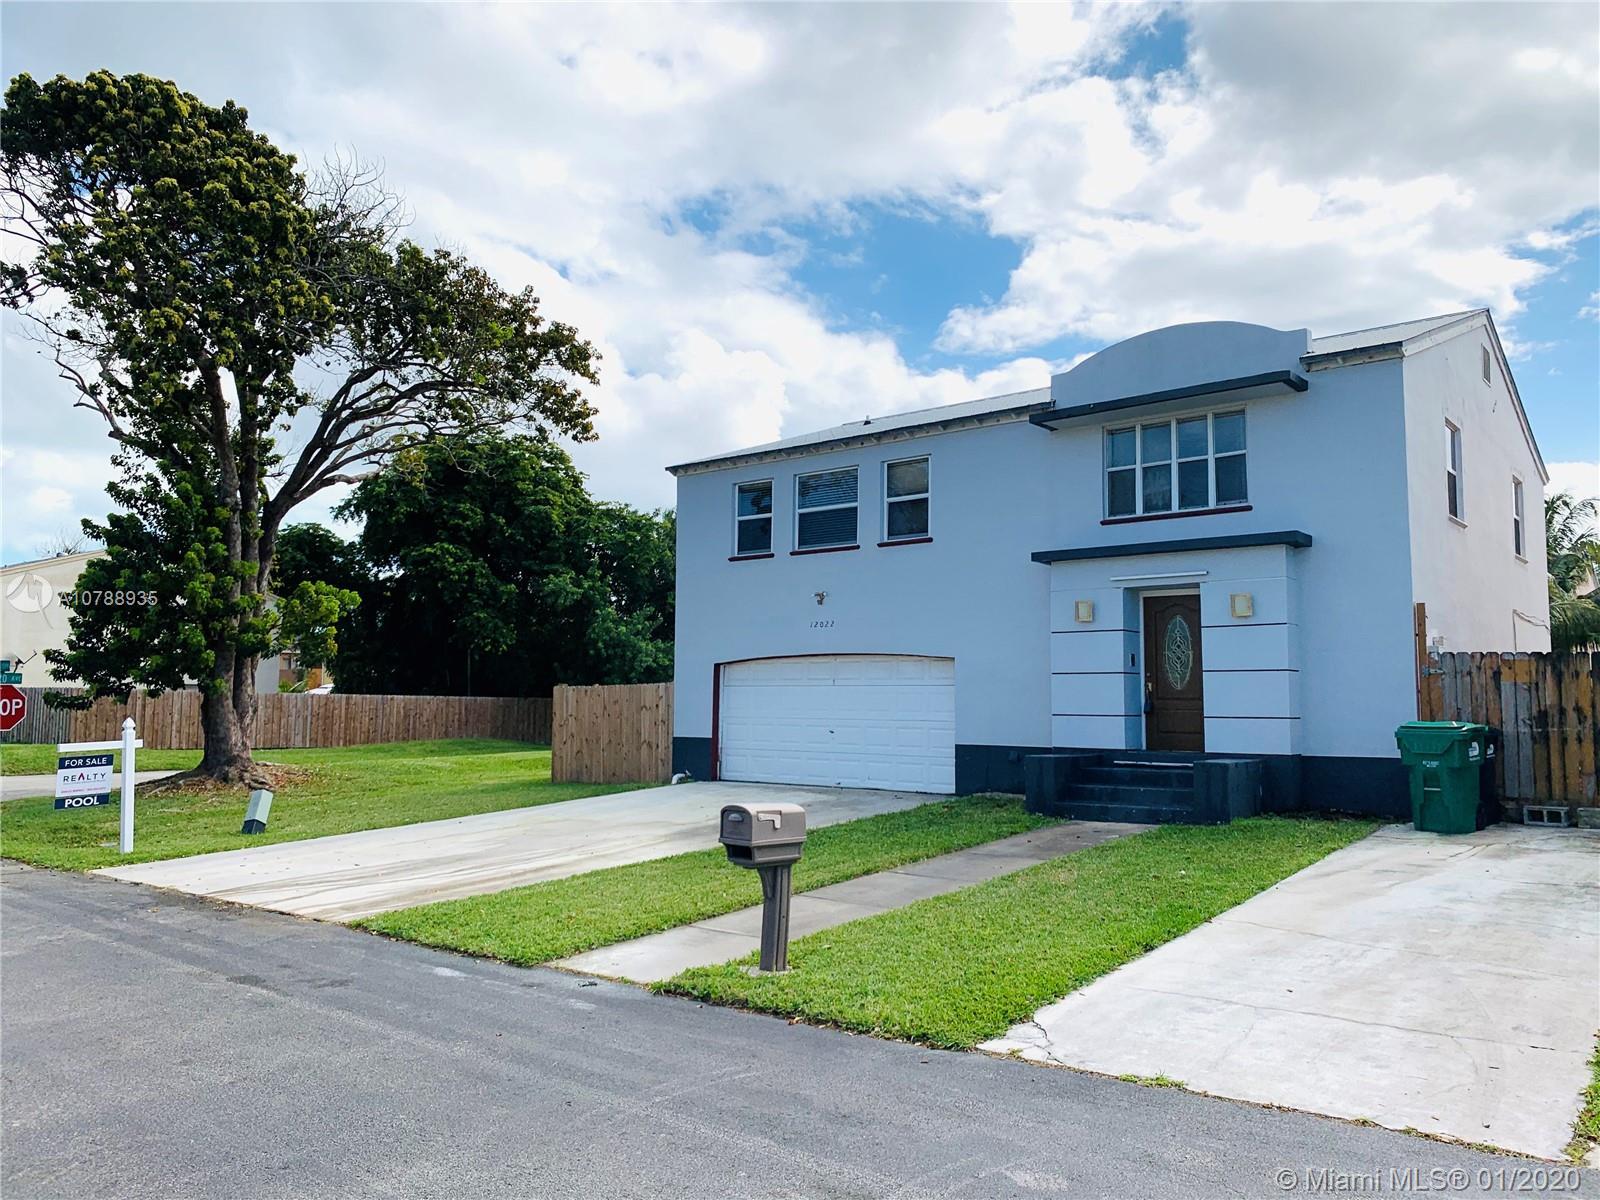 12022 SW 271st Ter, Homestead, FL 33032 - Homestead, FL real estate listing